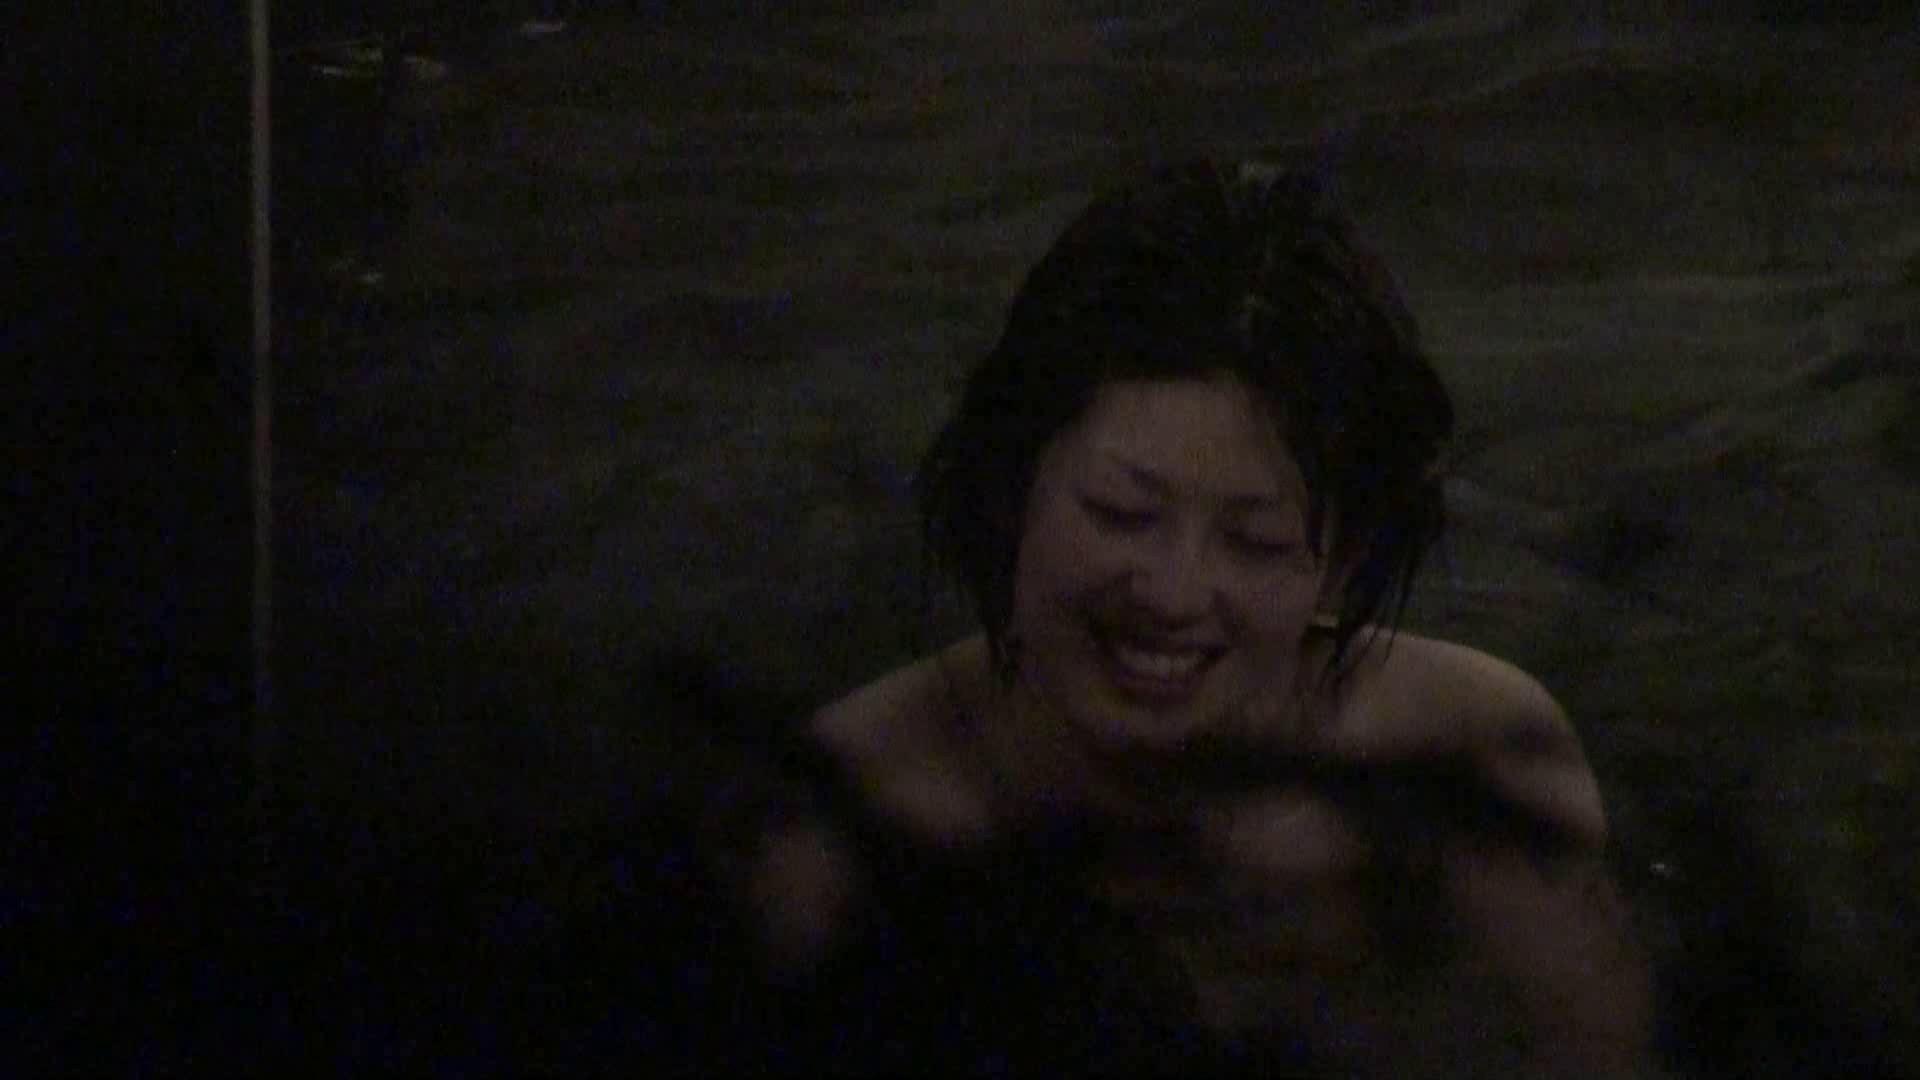 Aquaな露天風呂Vol.376 0   0  47連発 13